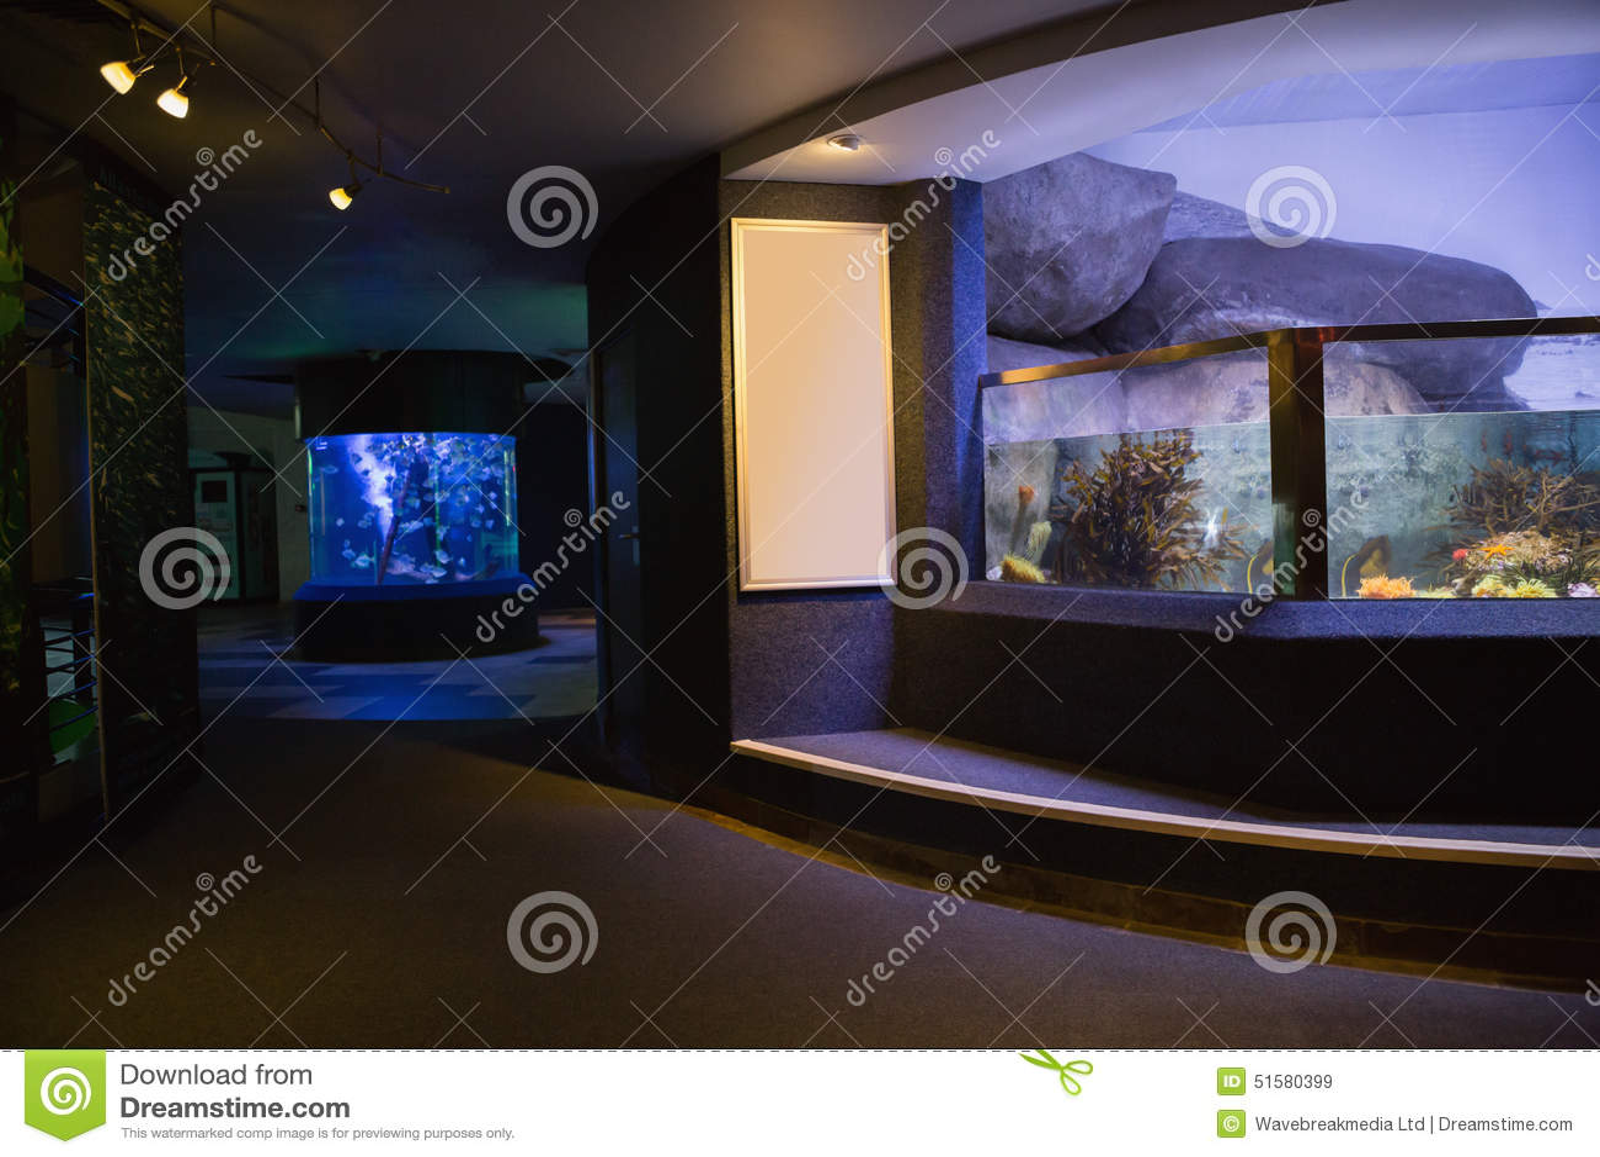 Lit Up Fish Tank Stock Image Image Of Fish Environment 51580399